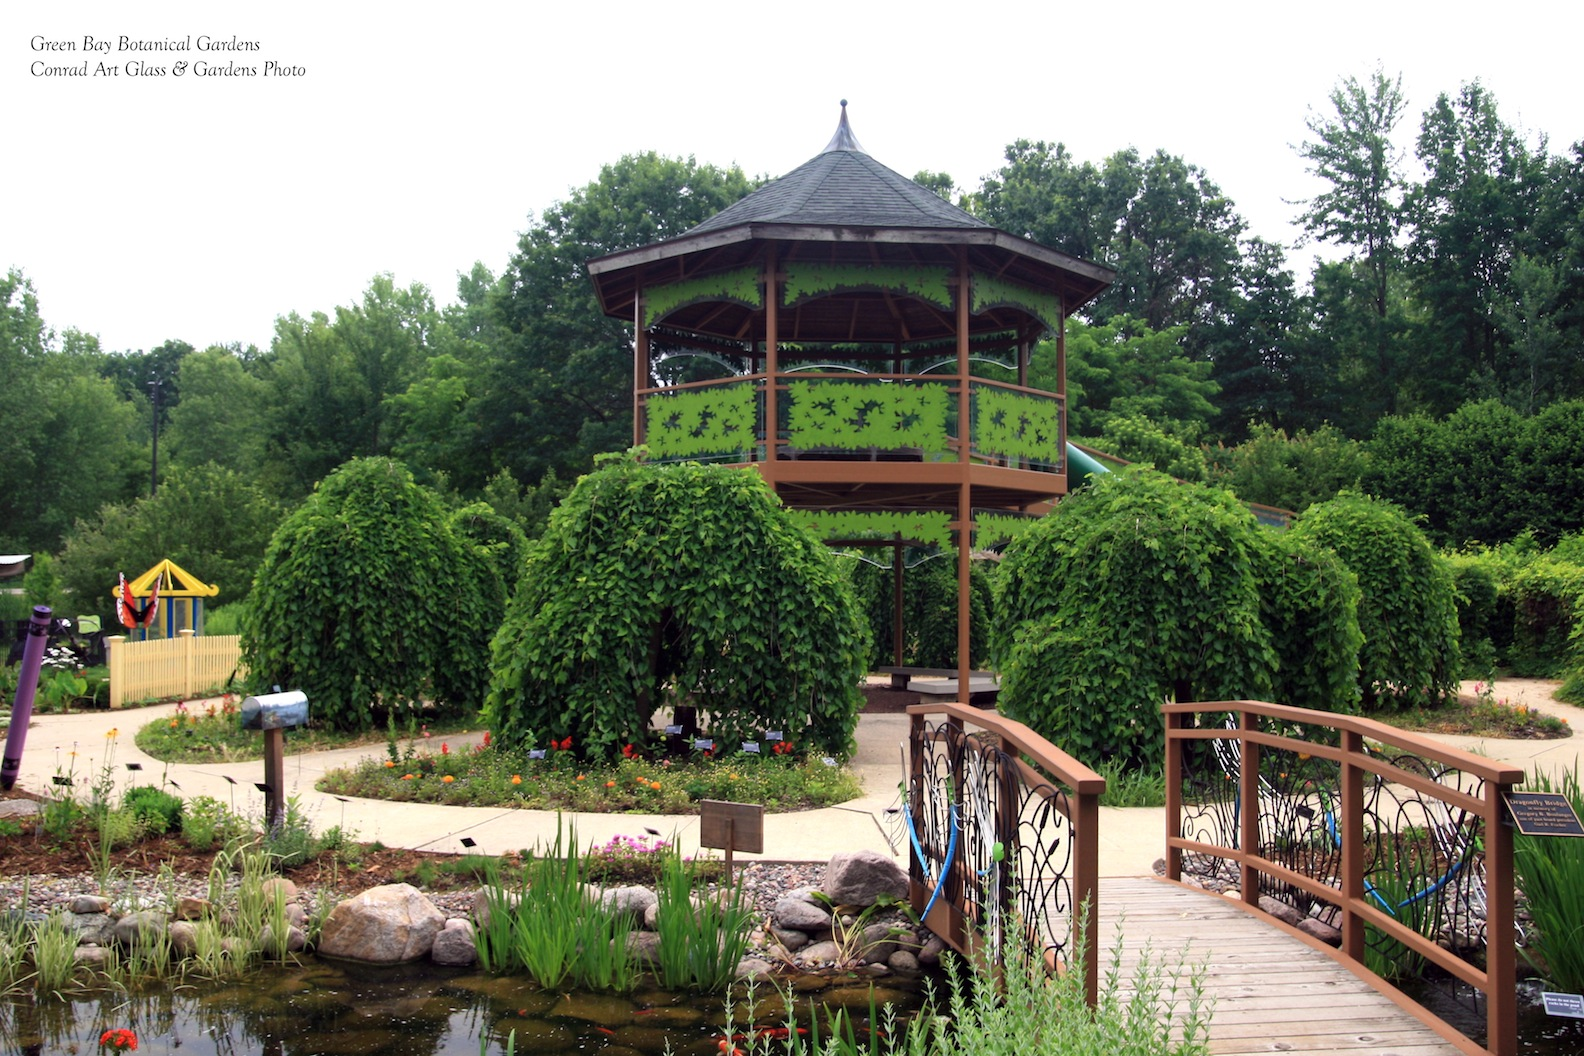 Green Bay Botanical Gardens Panoramio Photo Of Path Inside The Green Bay Botanical Gardens